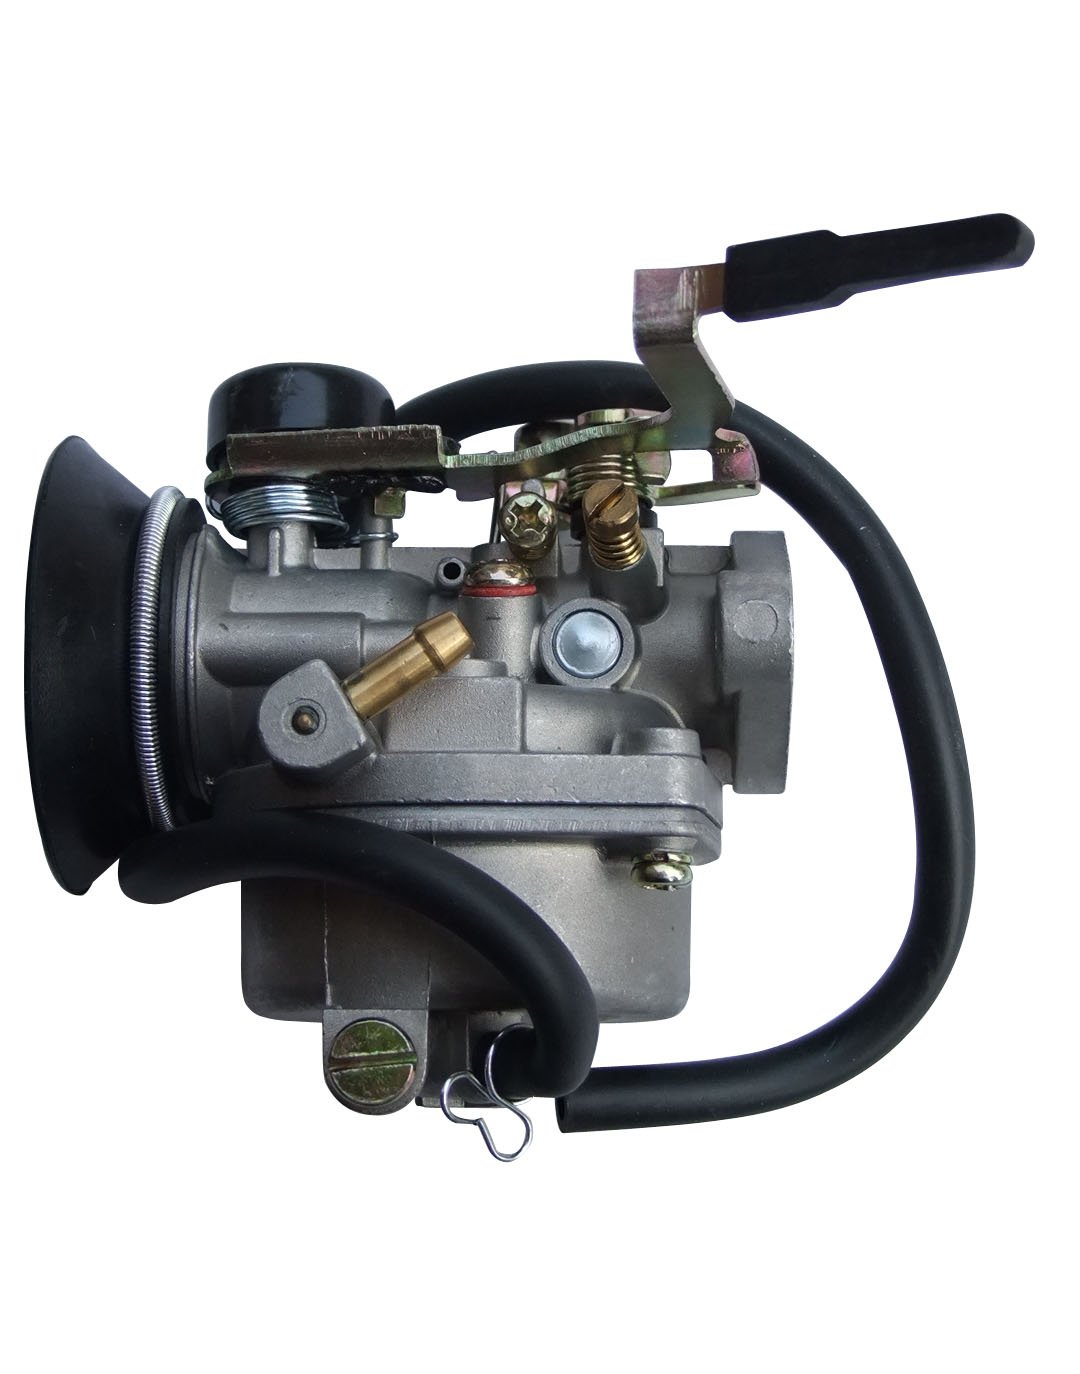 shamofeng Carburetor For Honda Hobbit PA 50 PA50II 1978 1979 1980 1981 1982 1983